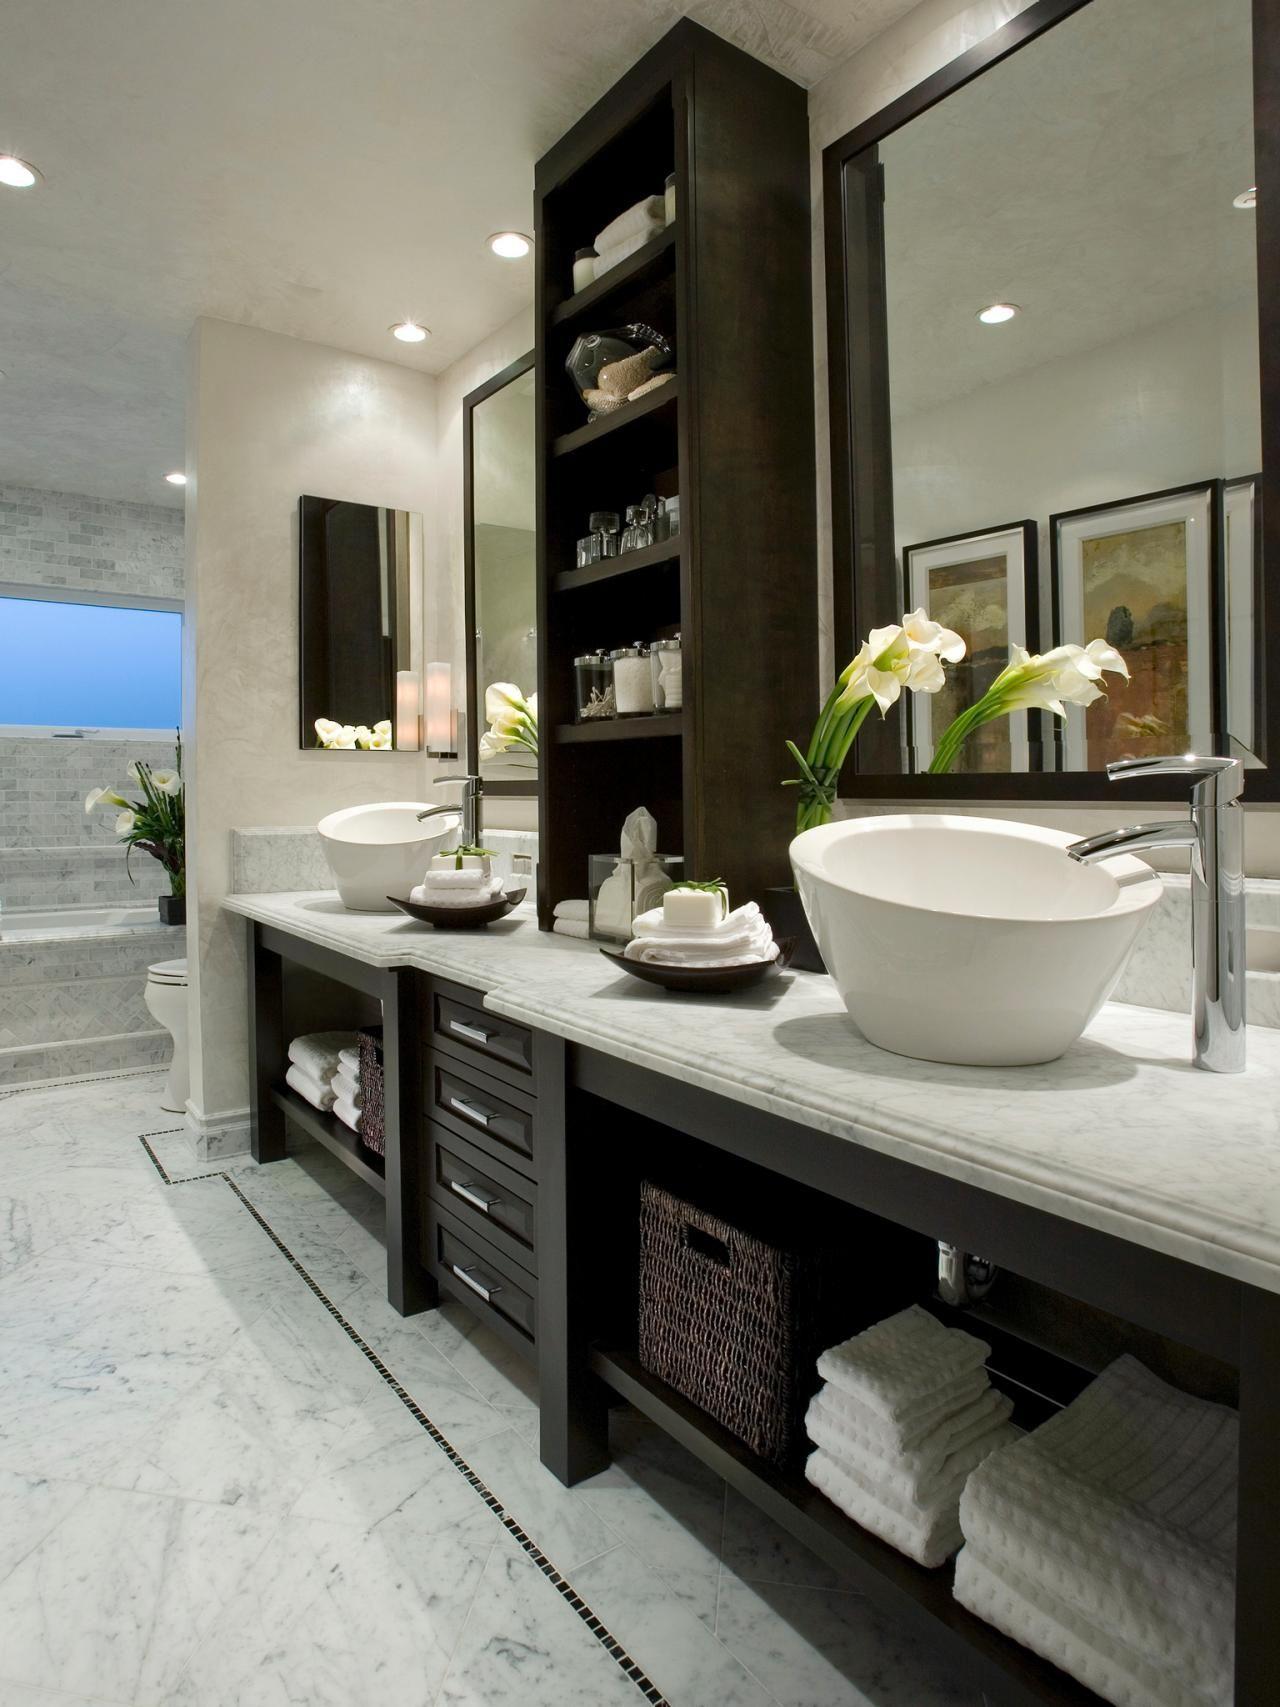 Top 50 Pinterest Gallery 2014 Spa Inspired Bathroom Modern